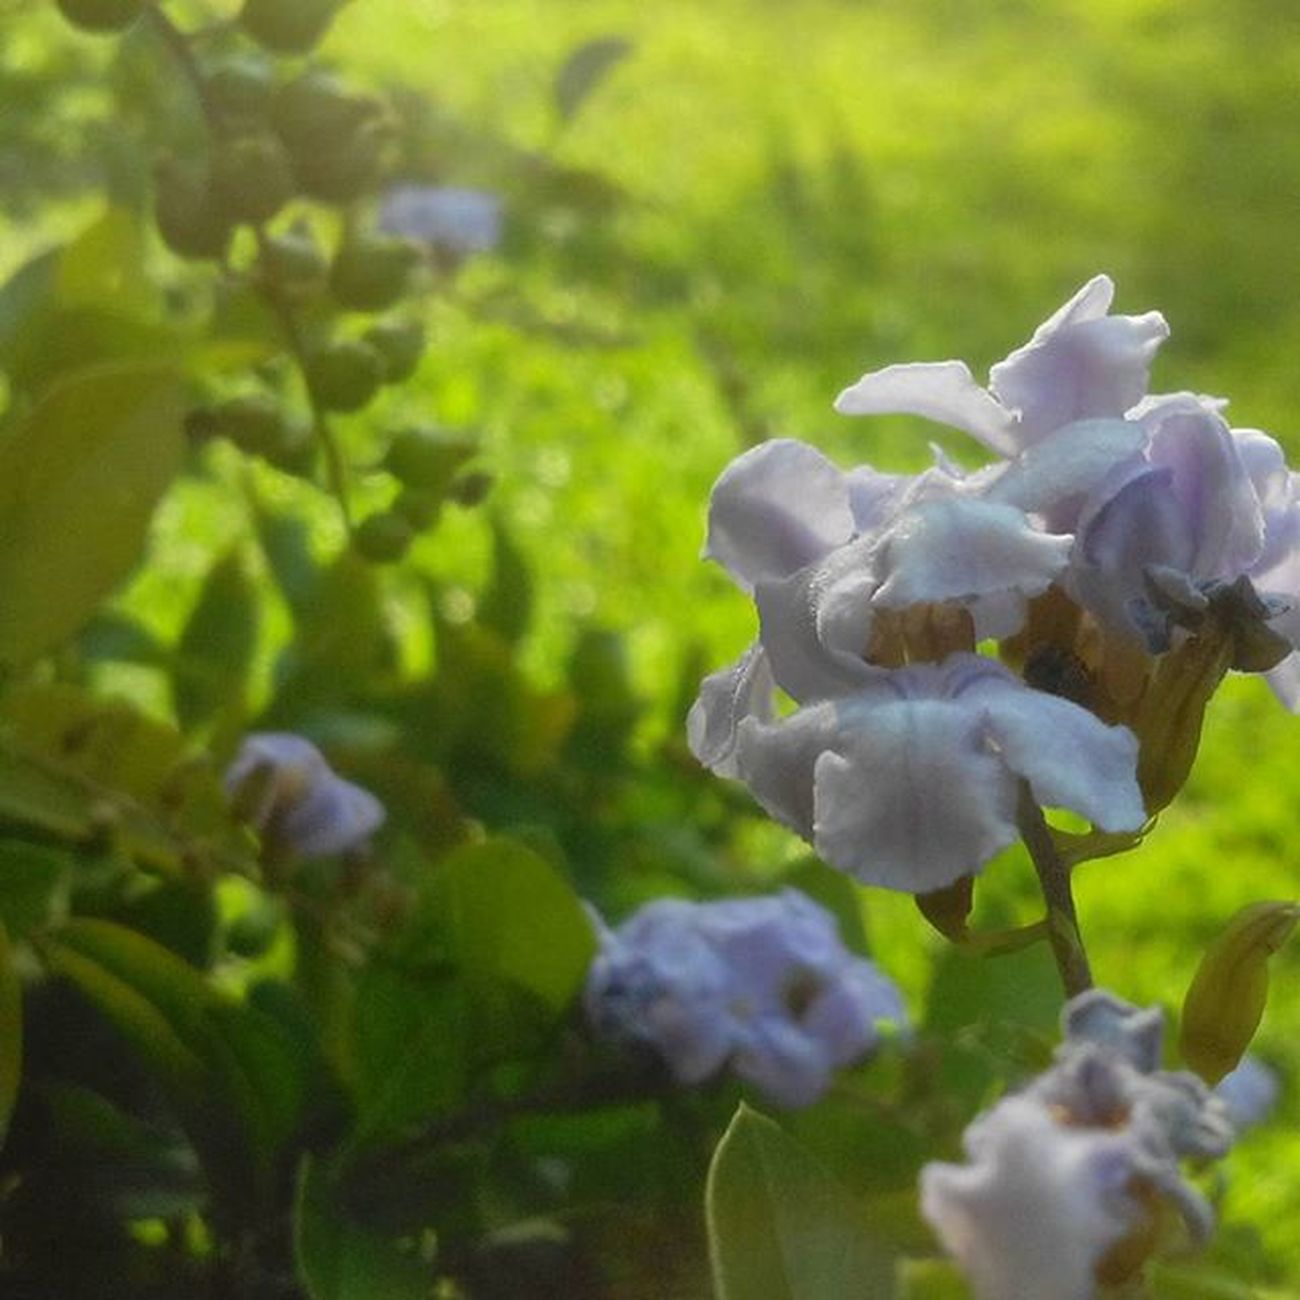 Amazing Amazingflower Flower Desenfoque Sumer Sumerday Crazy Beatiful Espectacular Loco Flor